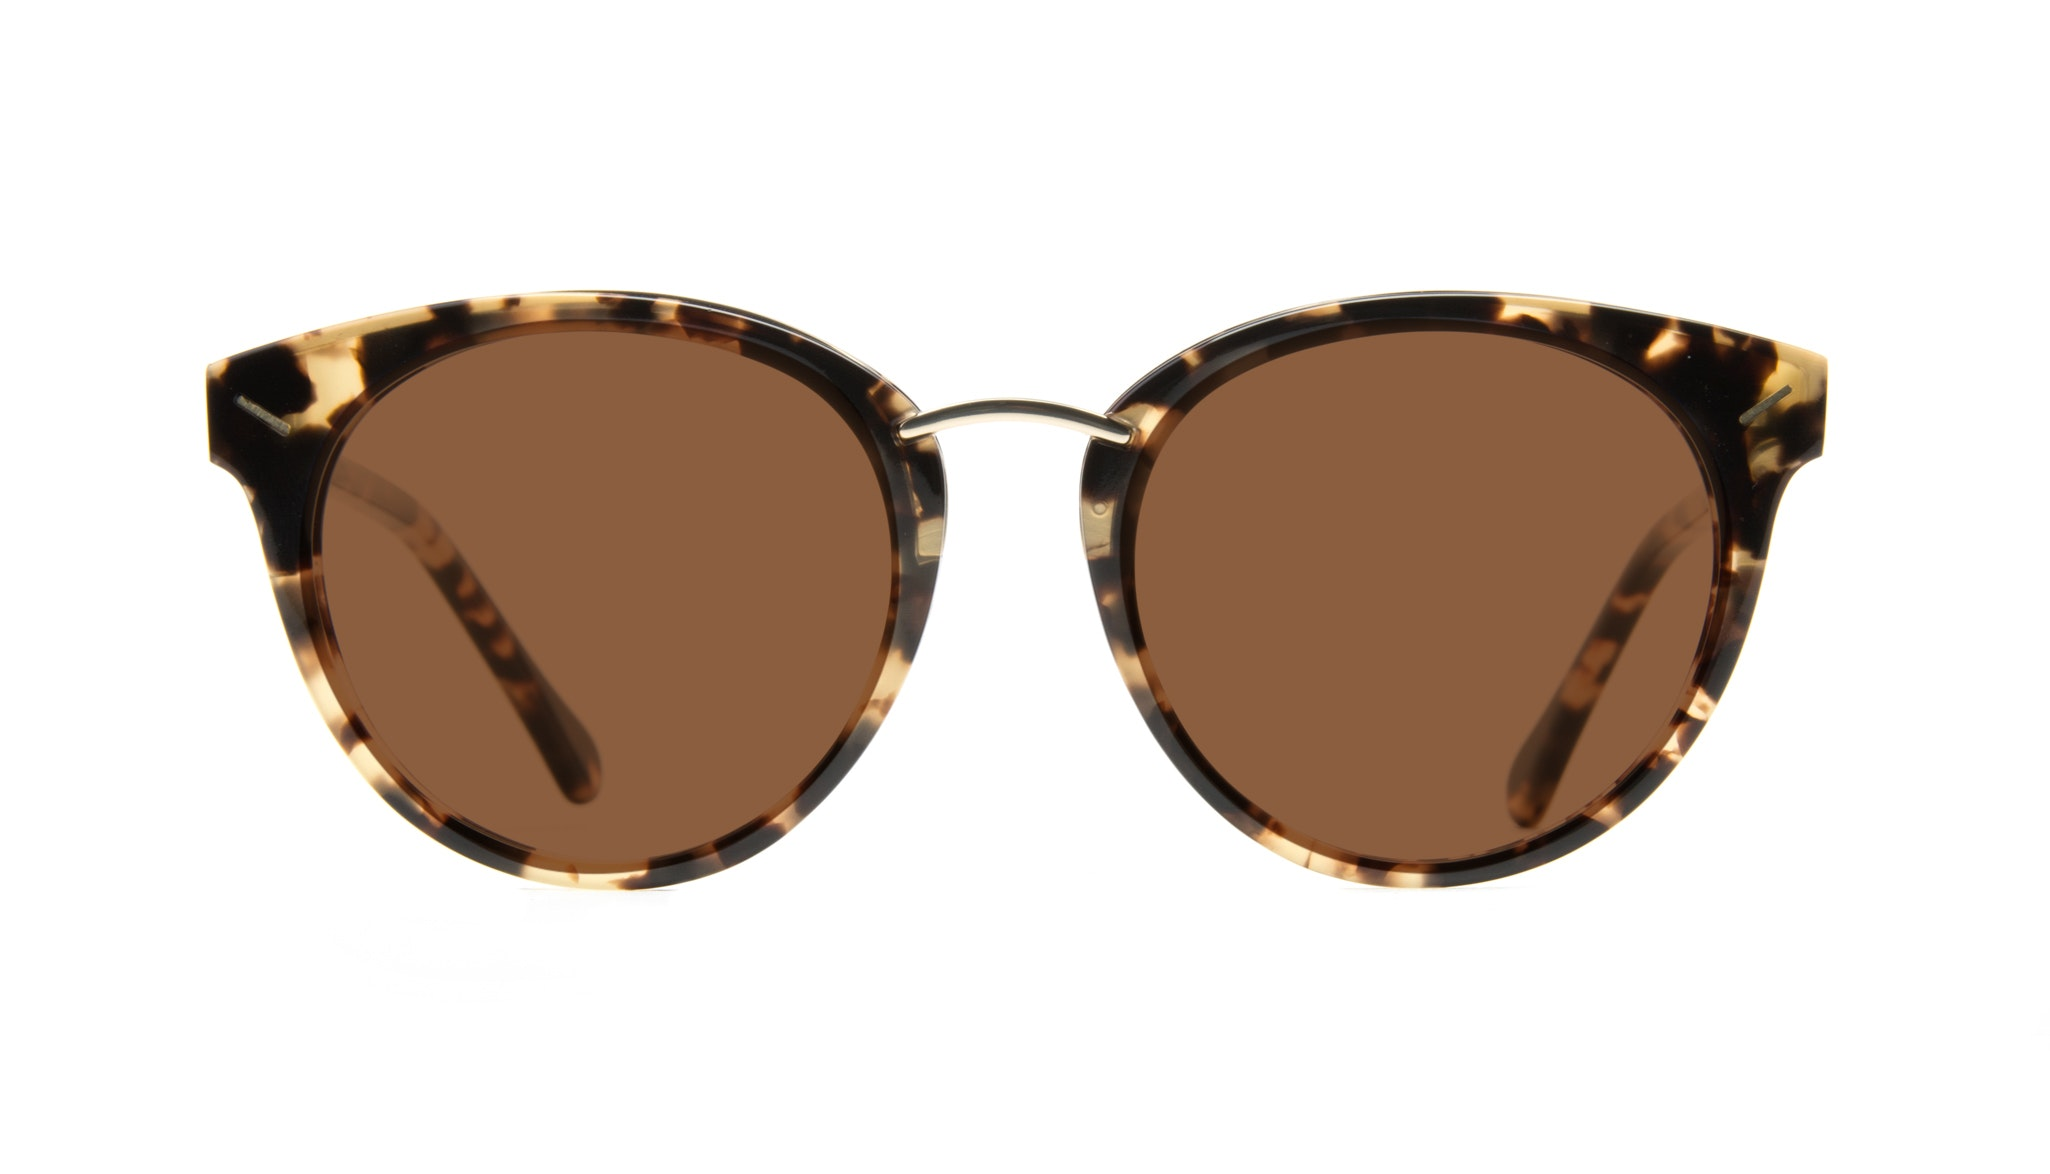 Affordable Fashion Glasses Round Eyeglasses Women Element Gold Tort